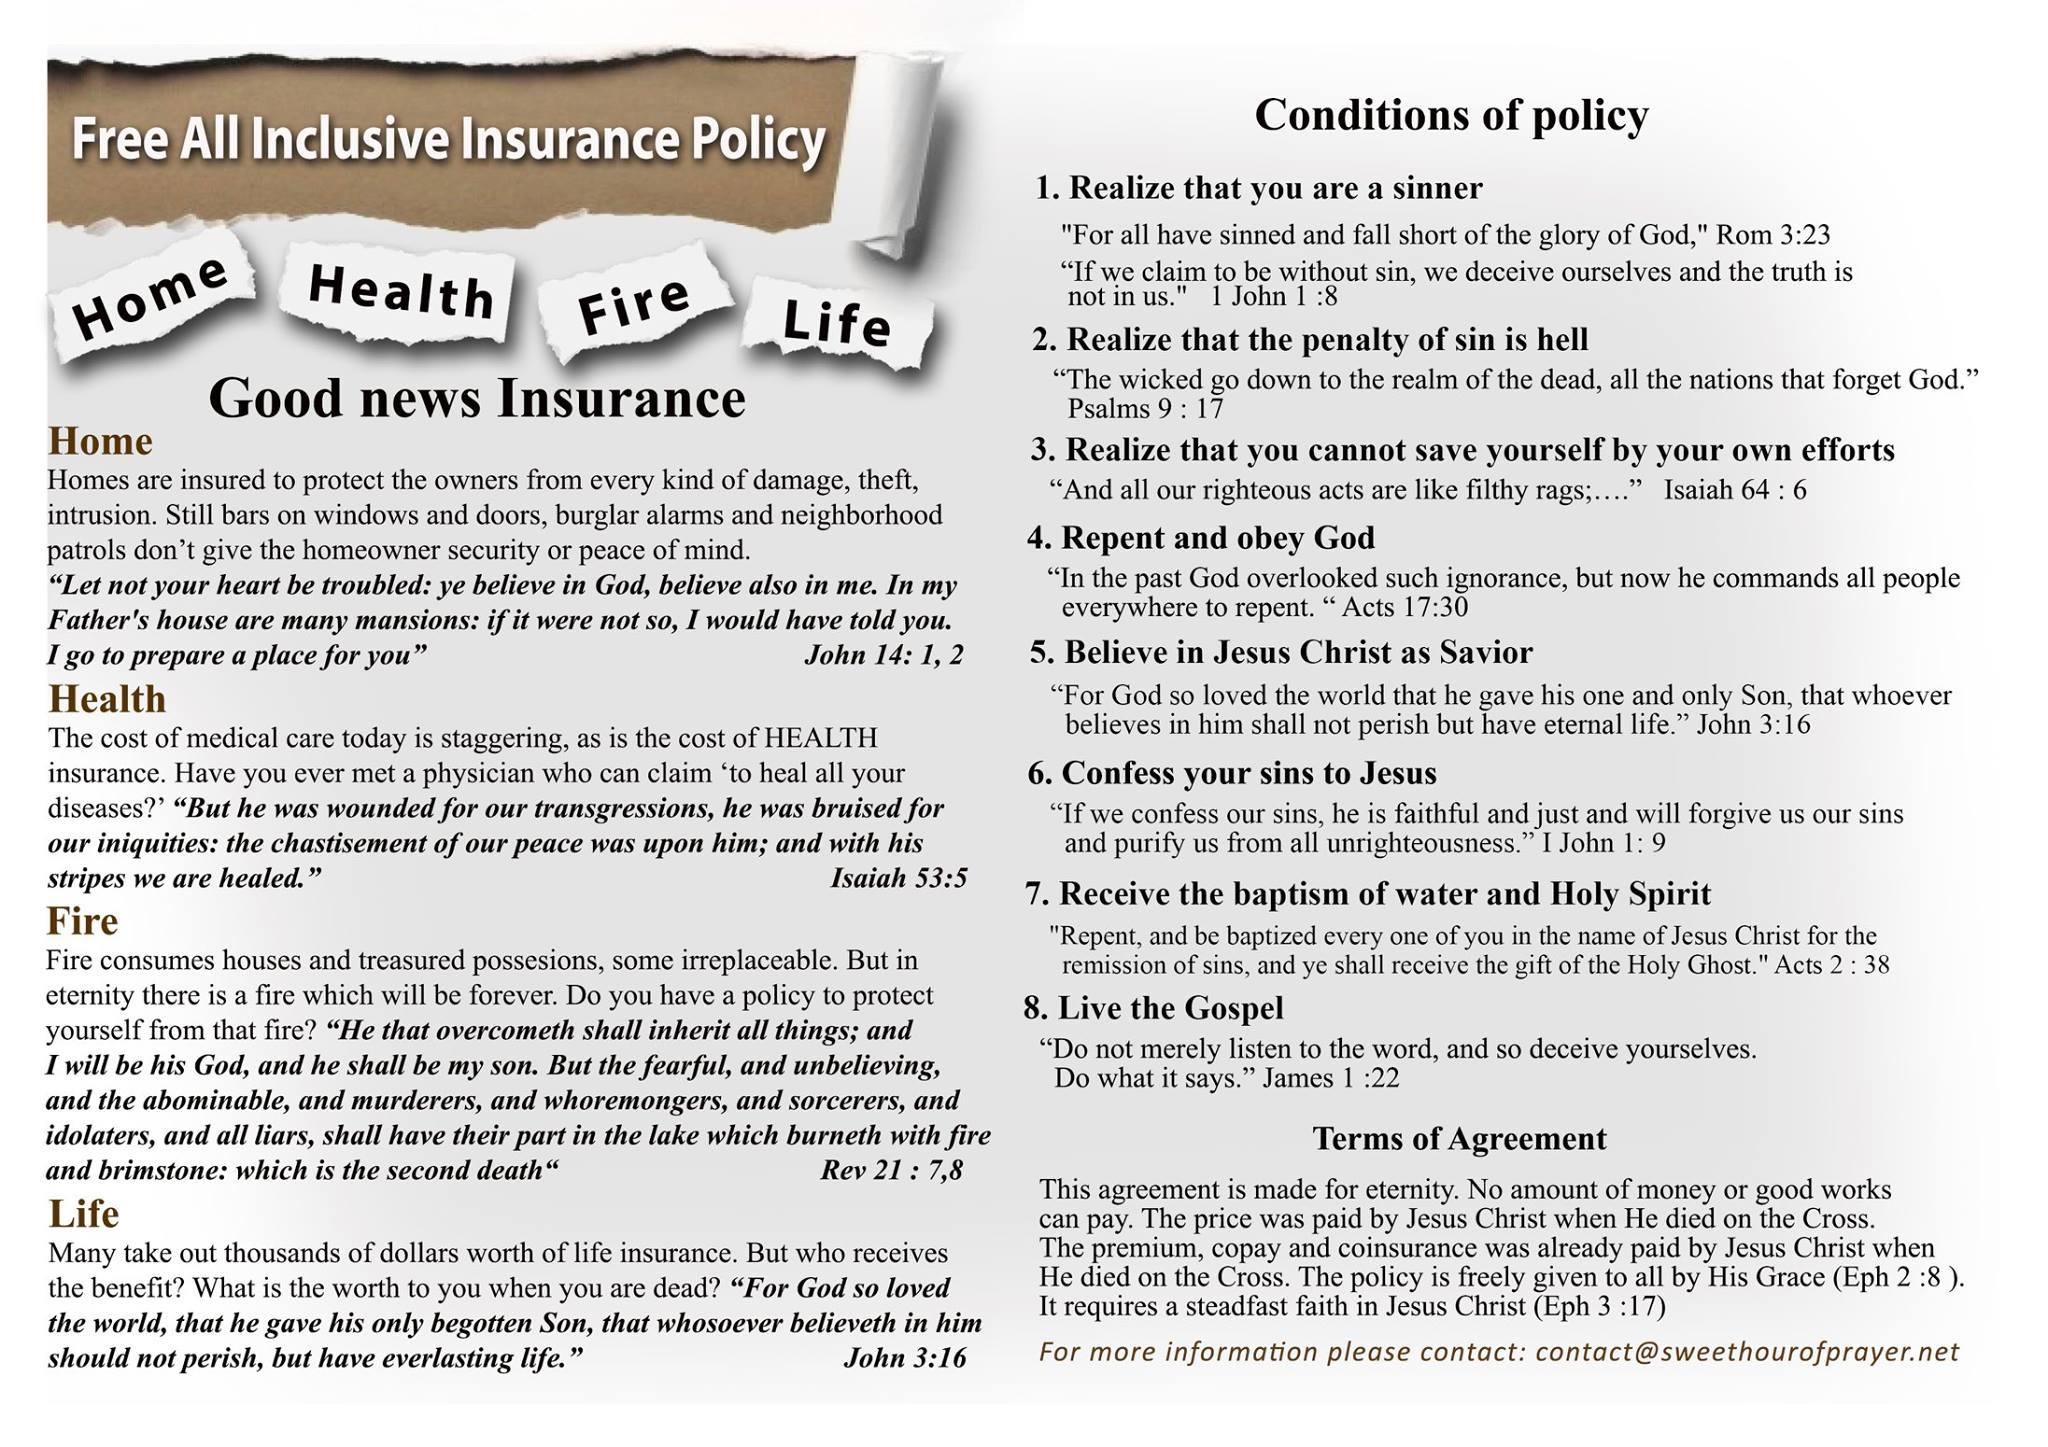 Good news Insurance